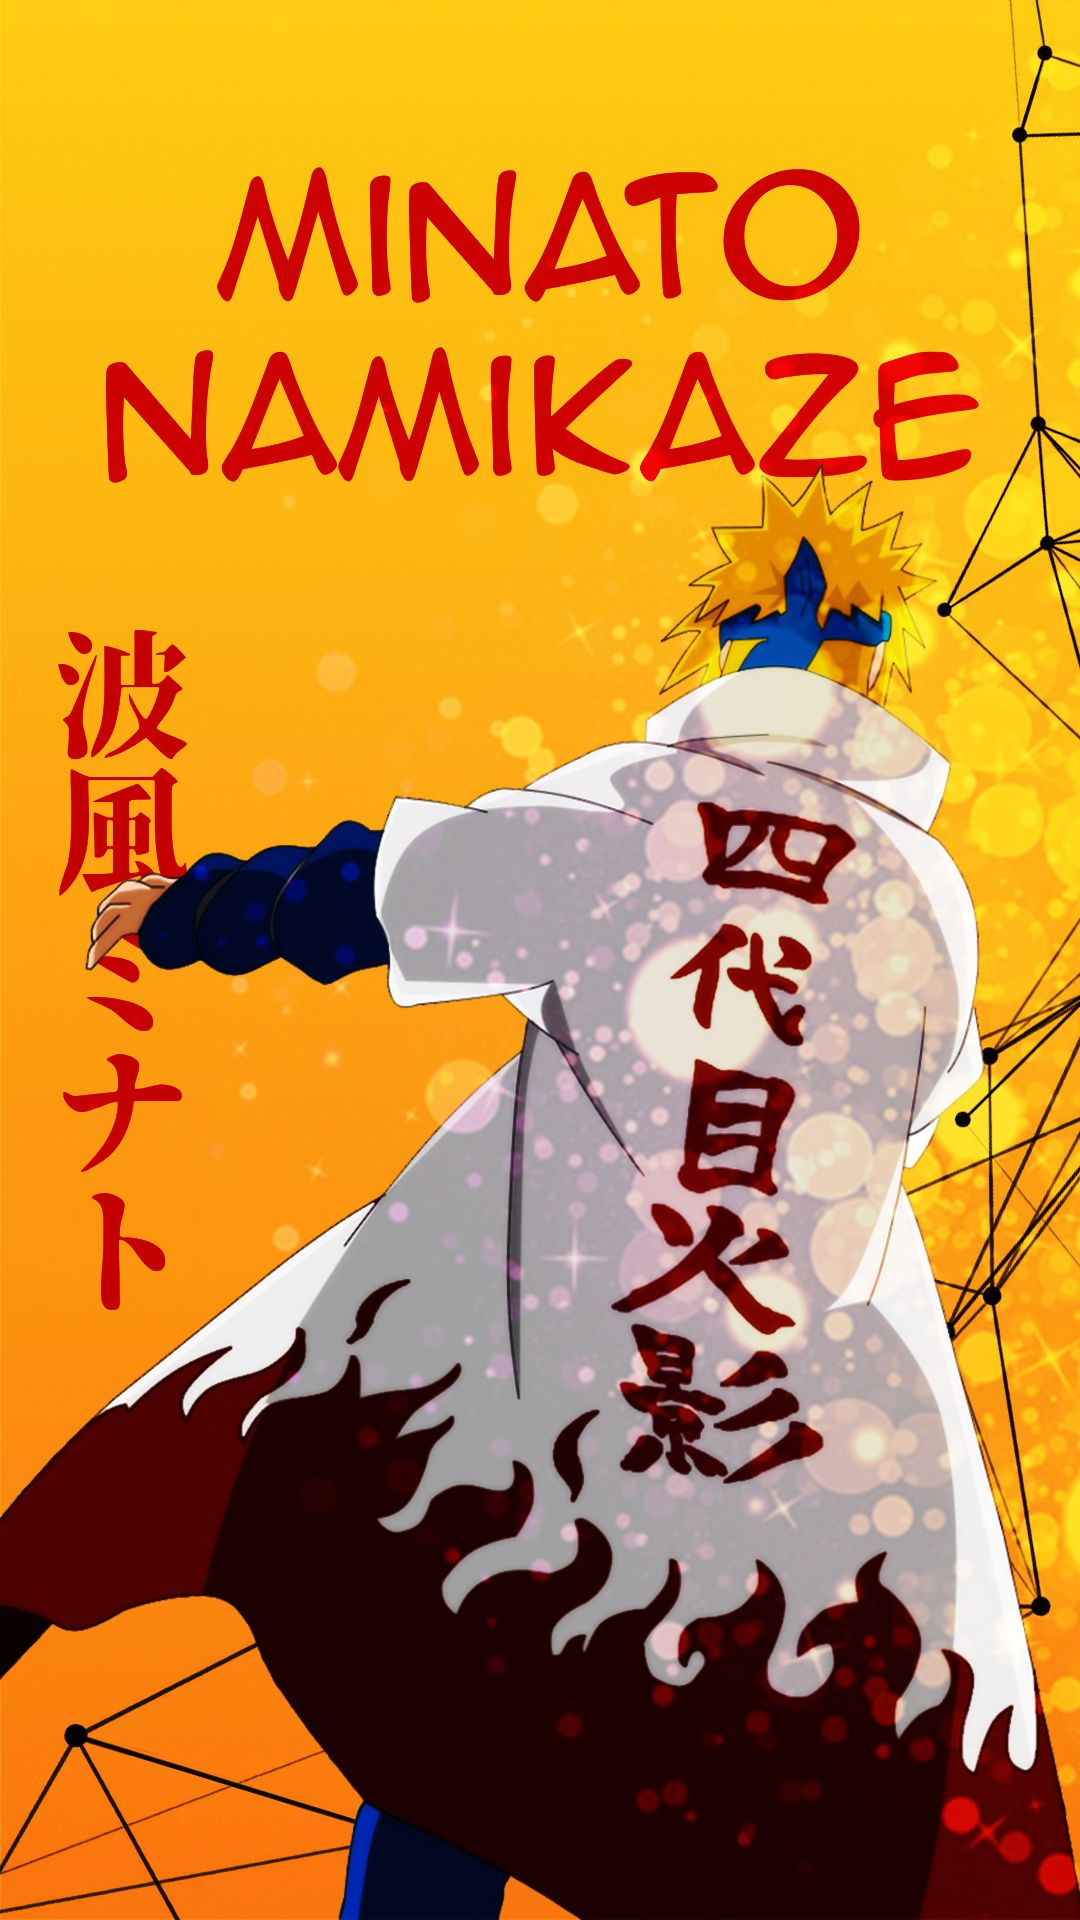 Minato Namikaze by Ajvr5 on DeviantArt